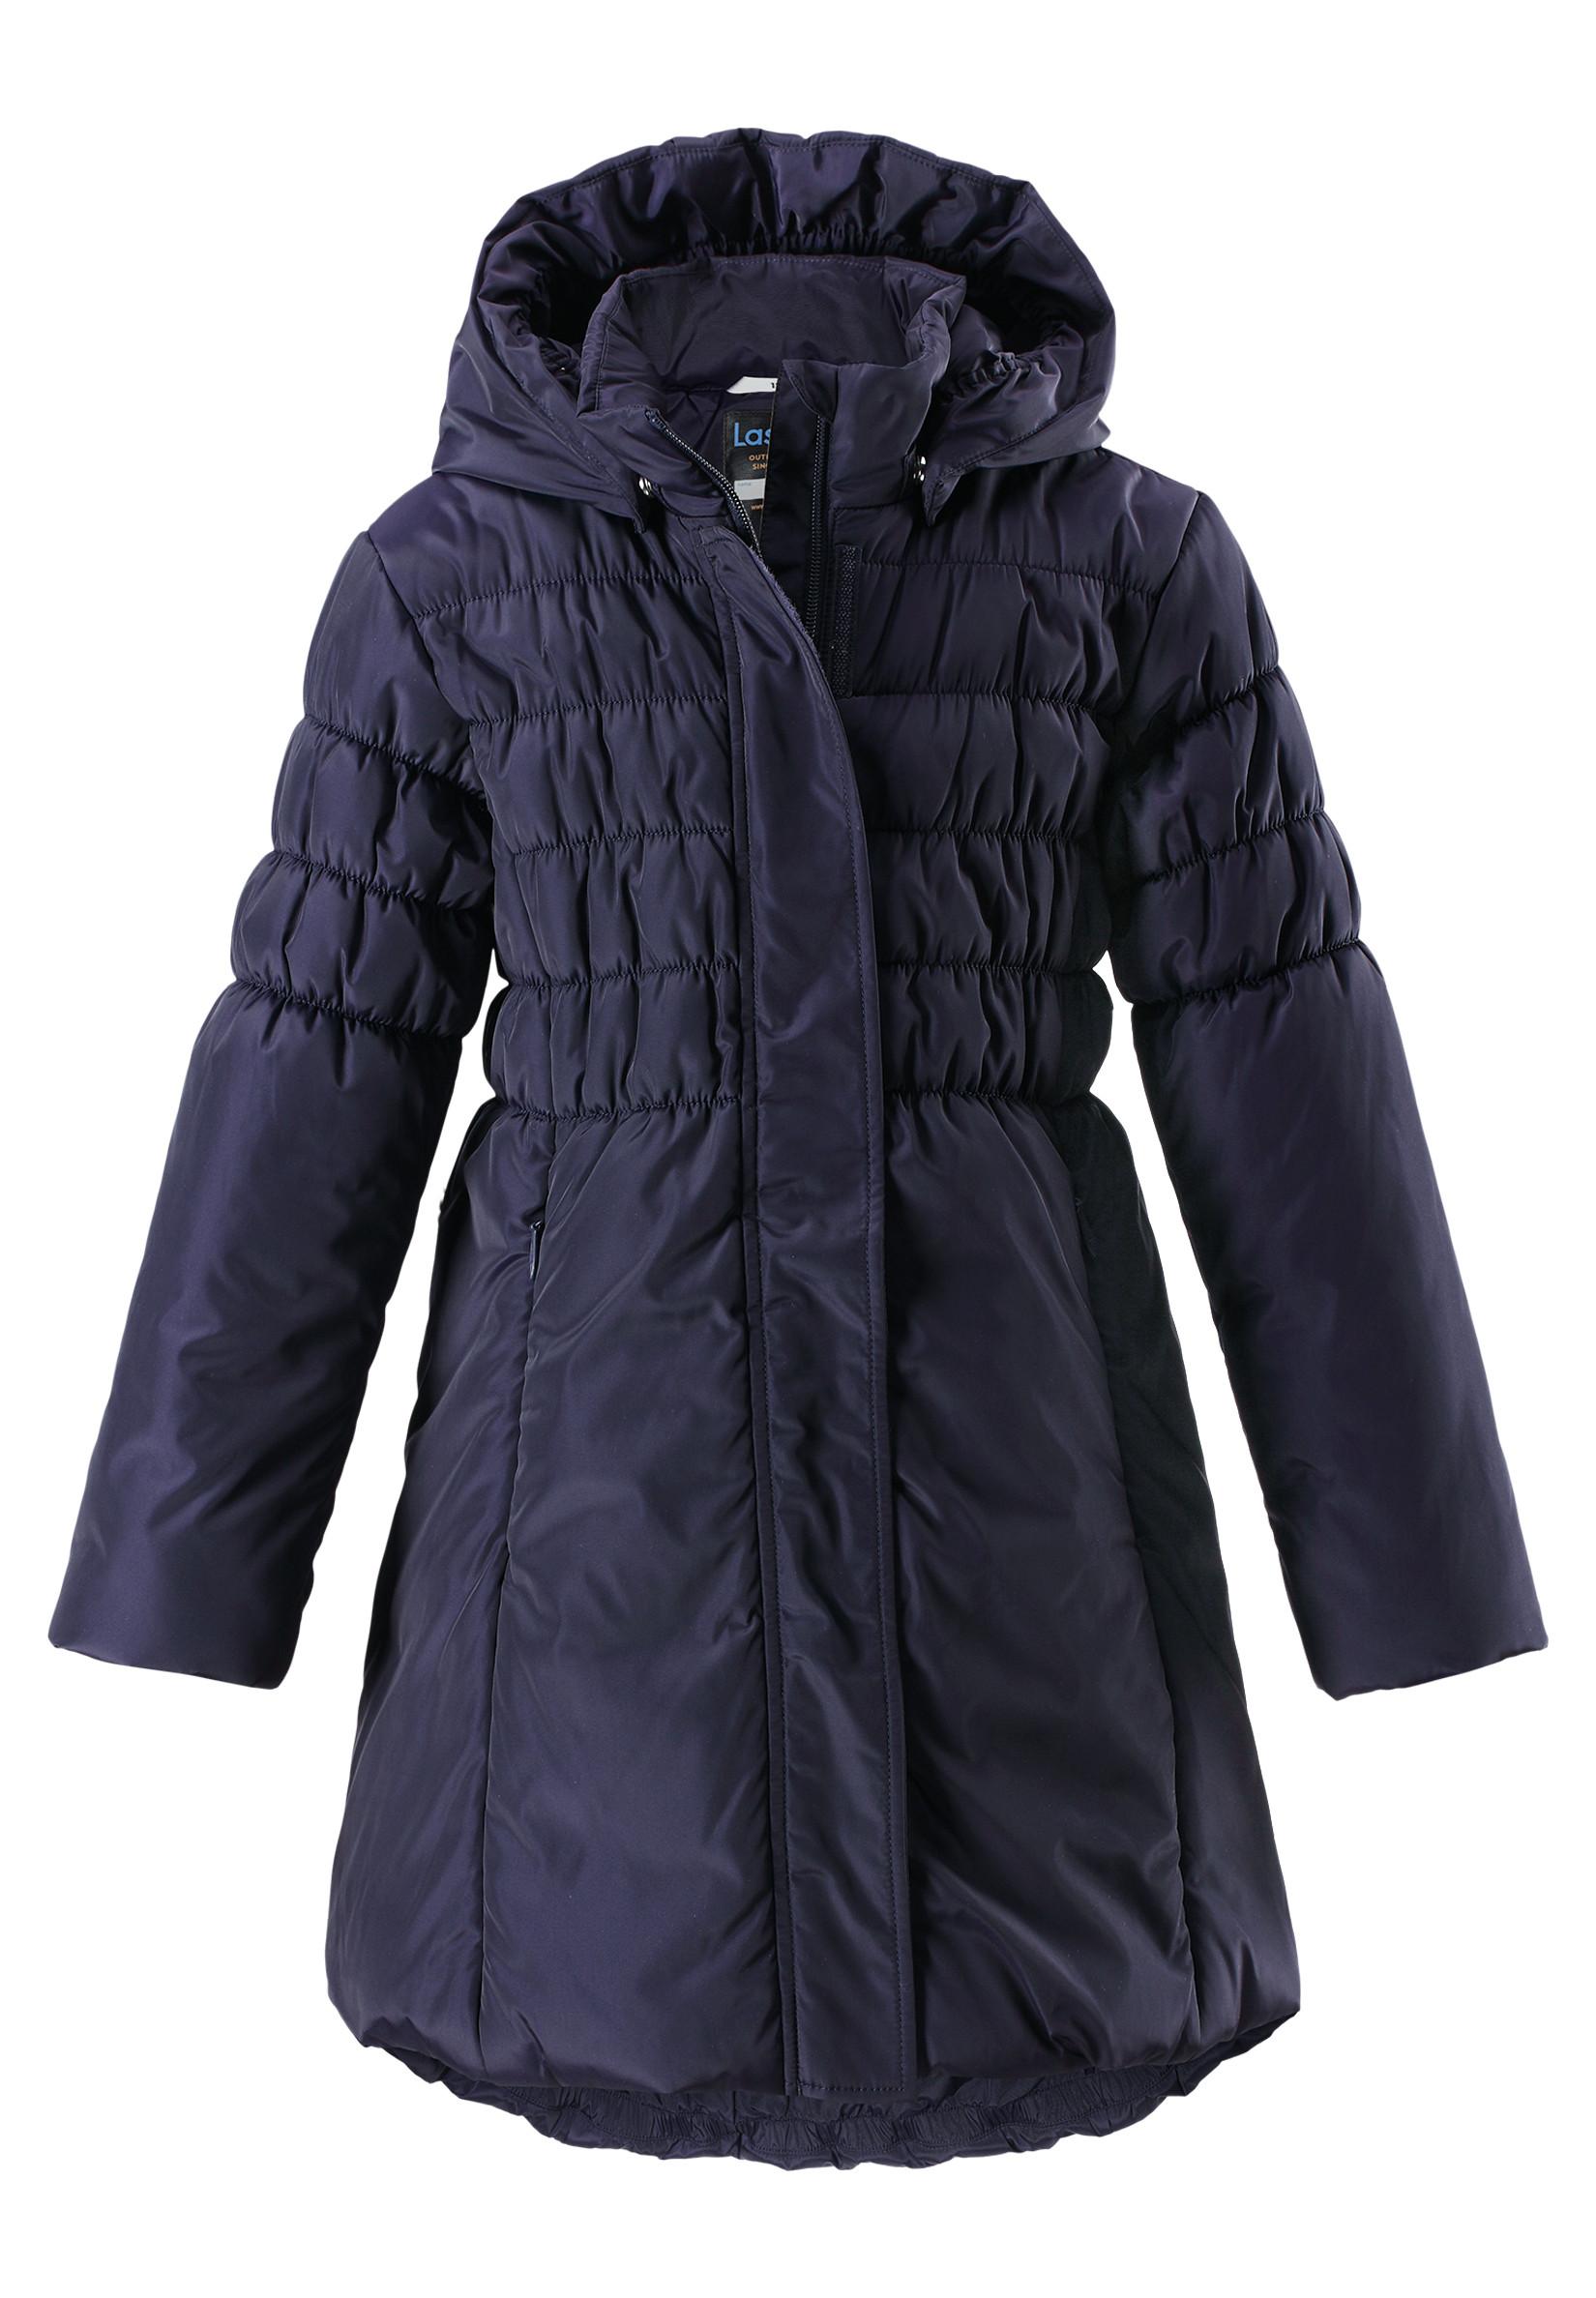 Пальто Lassie Пальто для девочки Lassie, синее куртки пальто пуховики lassie by reima куртка зимняя 721716